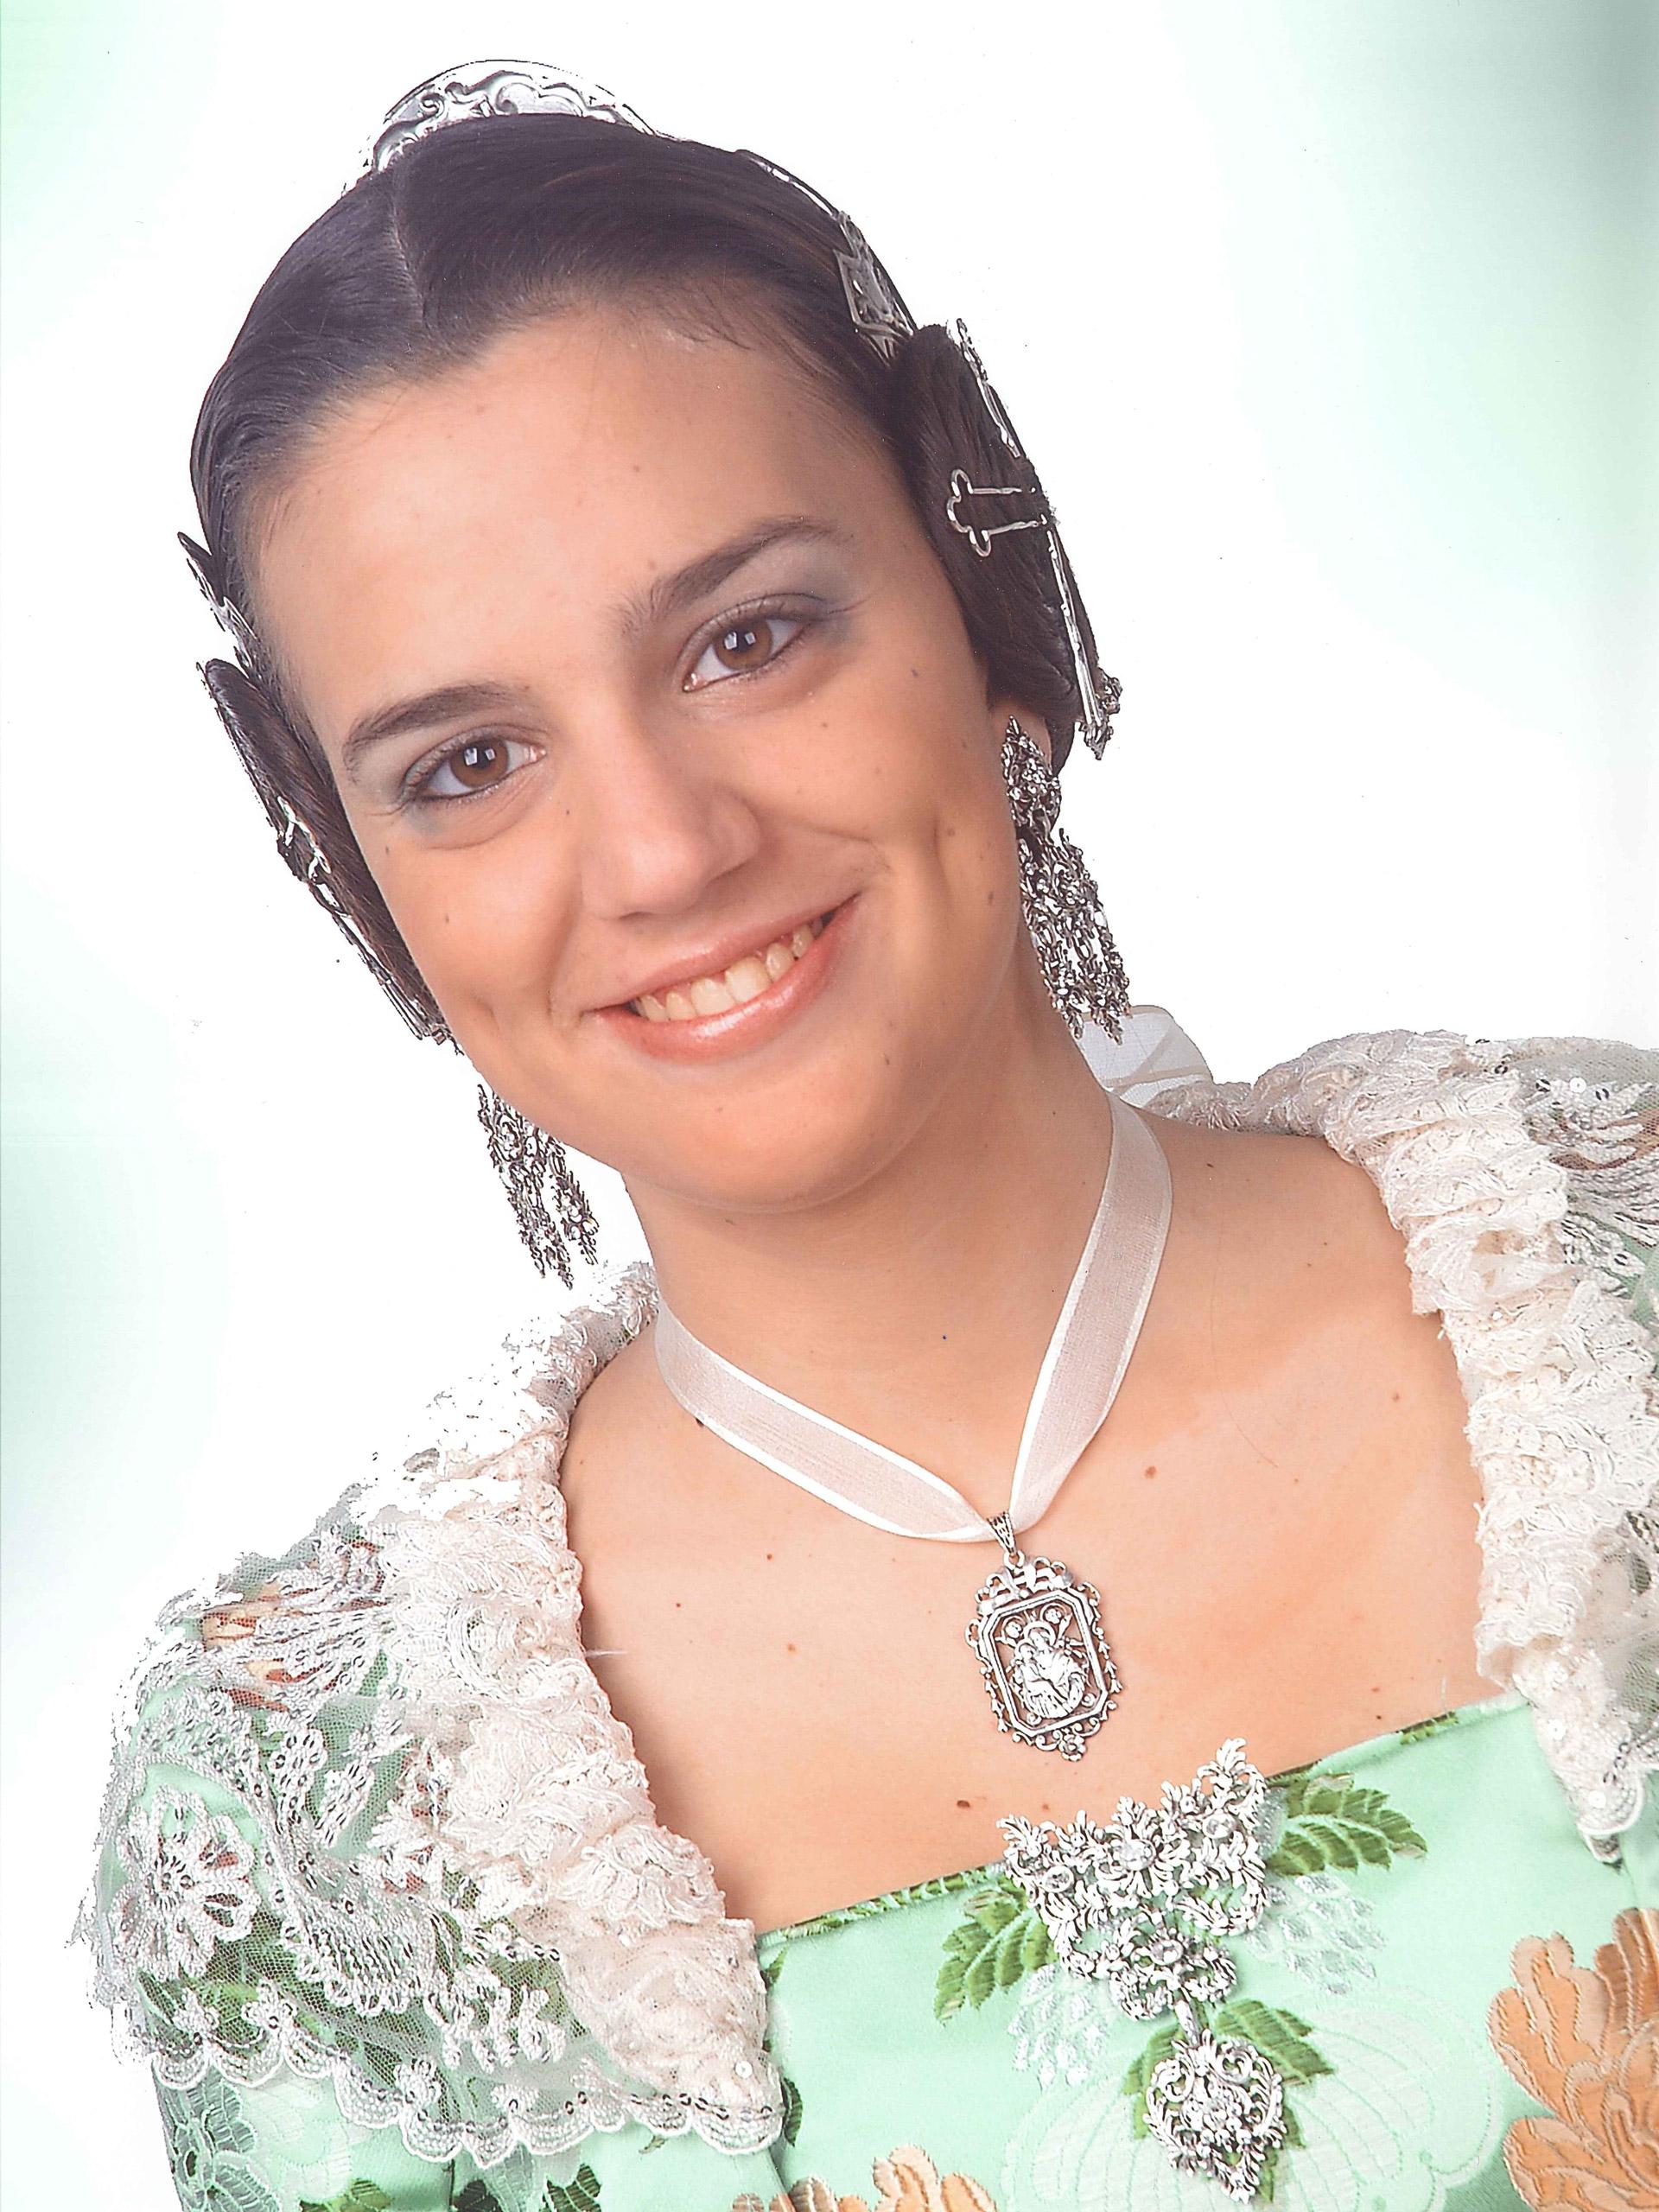 FM_2006